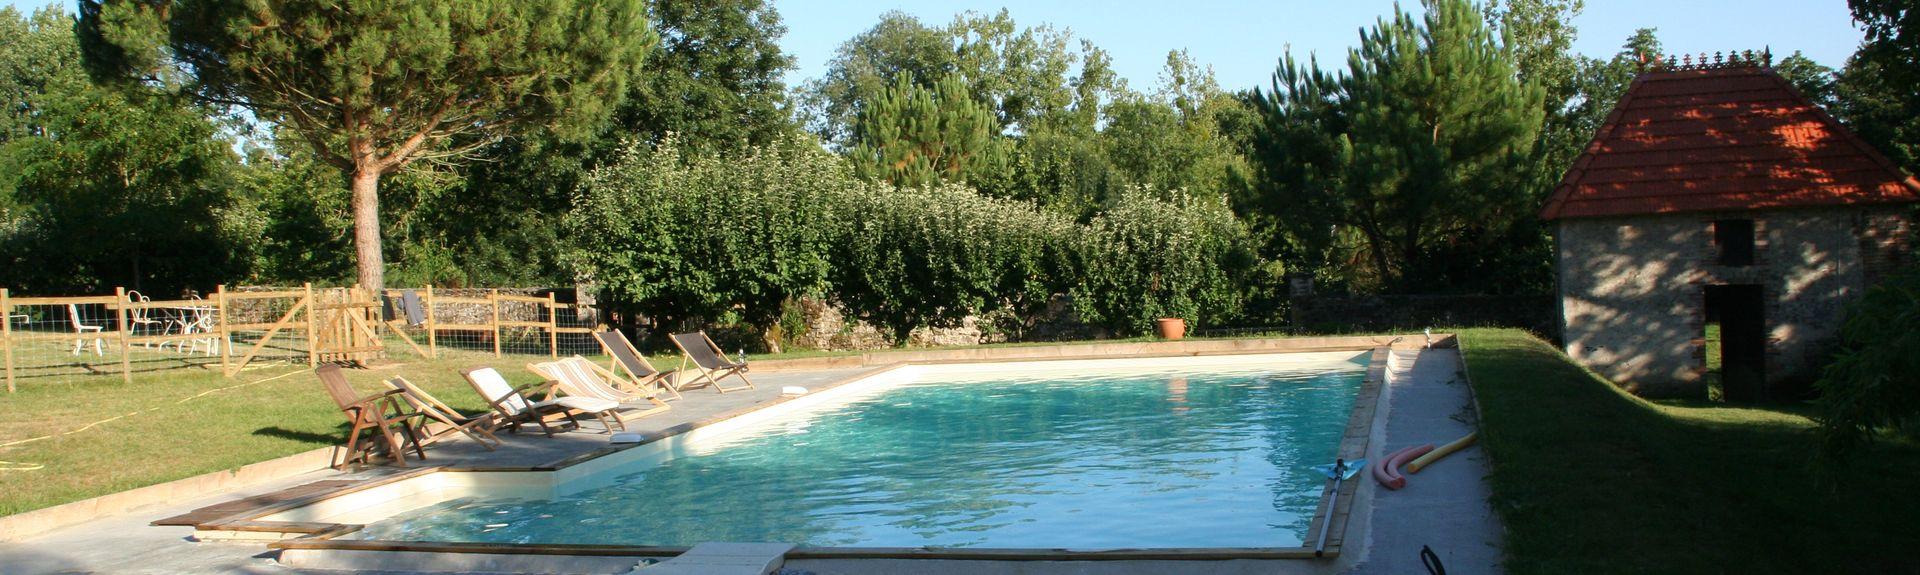 Bellevigny, Vendee (department), France